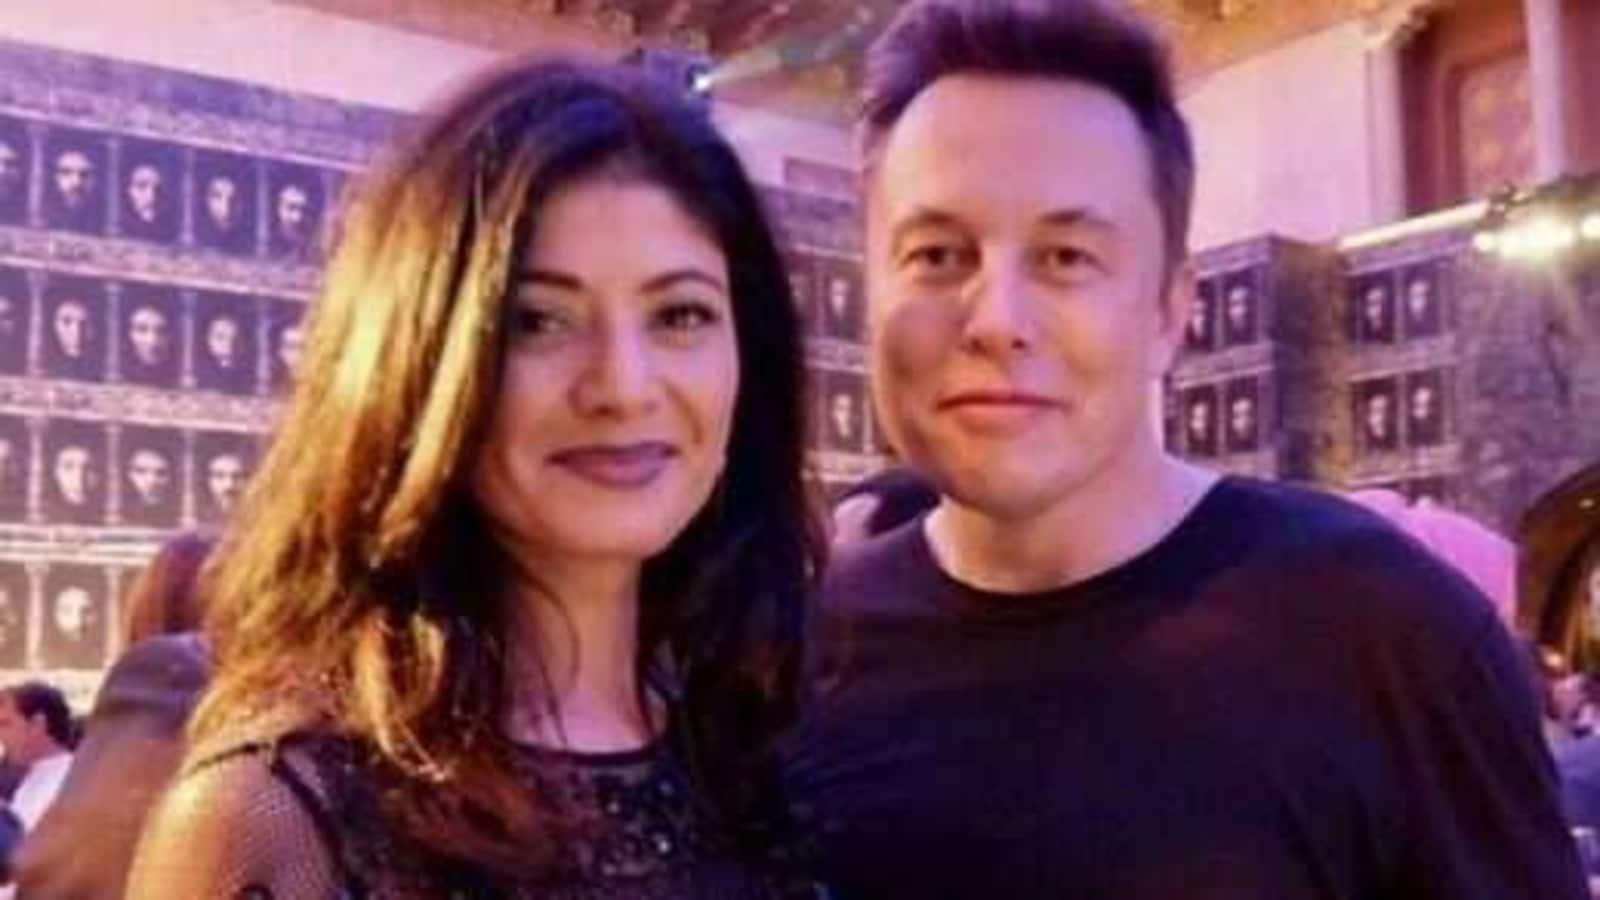 In 2018, did Pooja Batra meet Elon Musk's mother, Maye Musk? Take a look at throwback photos